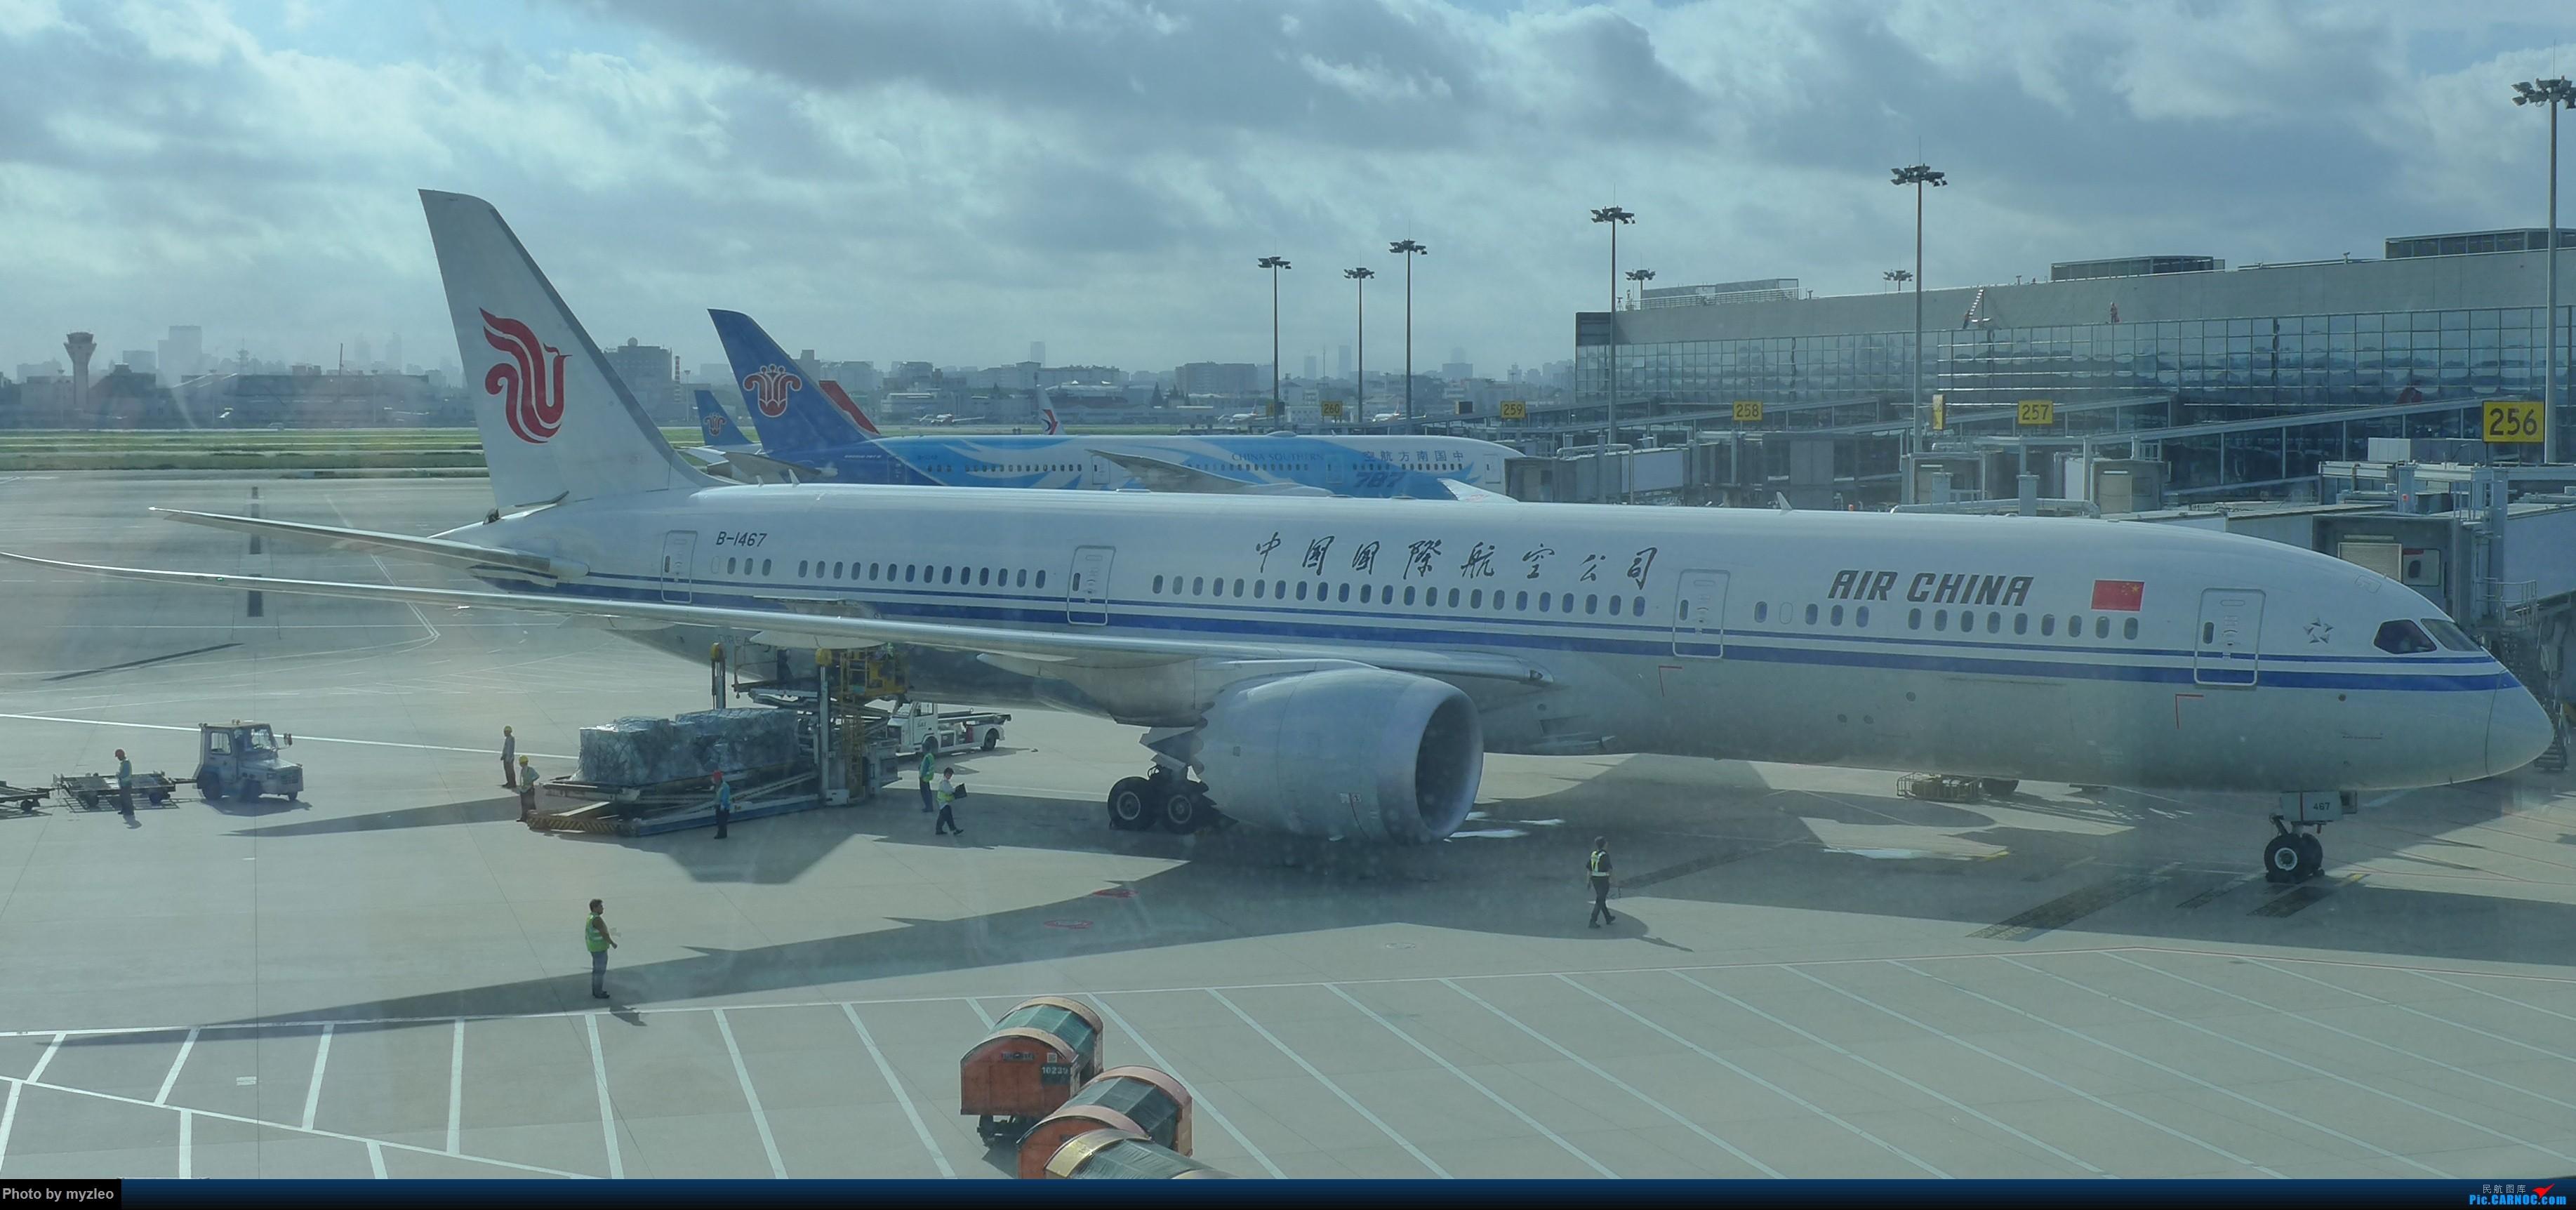 Re:[原创]【myzleo的游记2.1】昆洱风光(1)——SHA-KMG上航商务舱再体验+人在昆明 BOEING 787-9 B-1467 中国上海虹桥国际机场